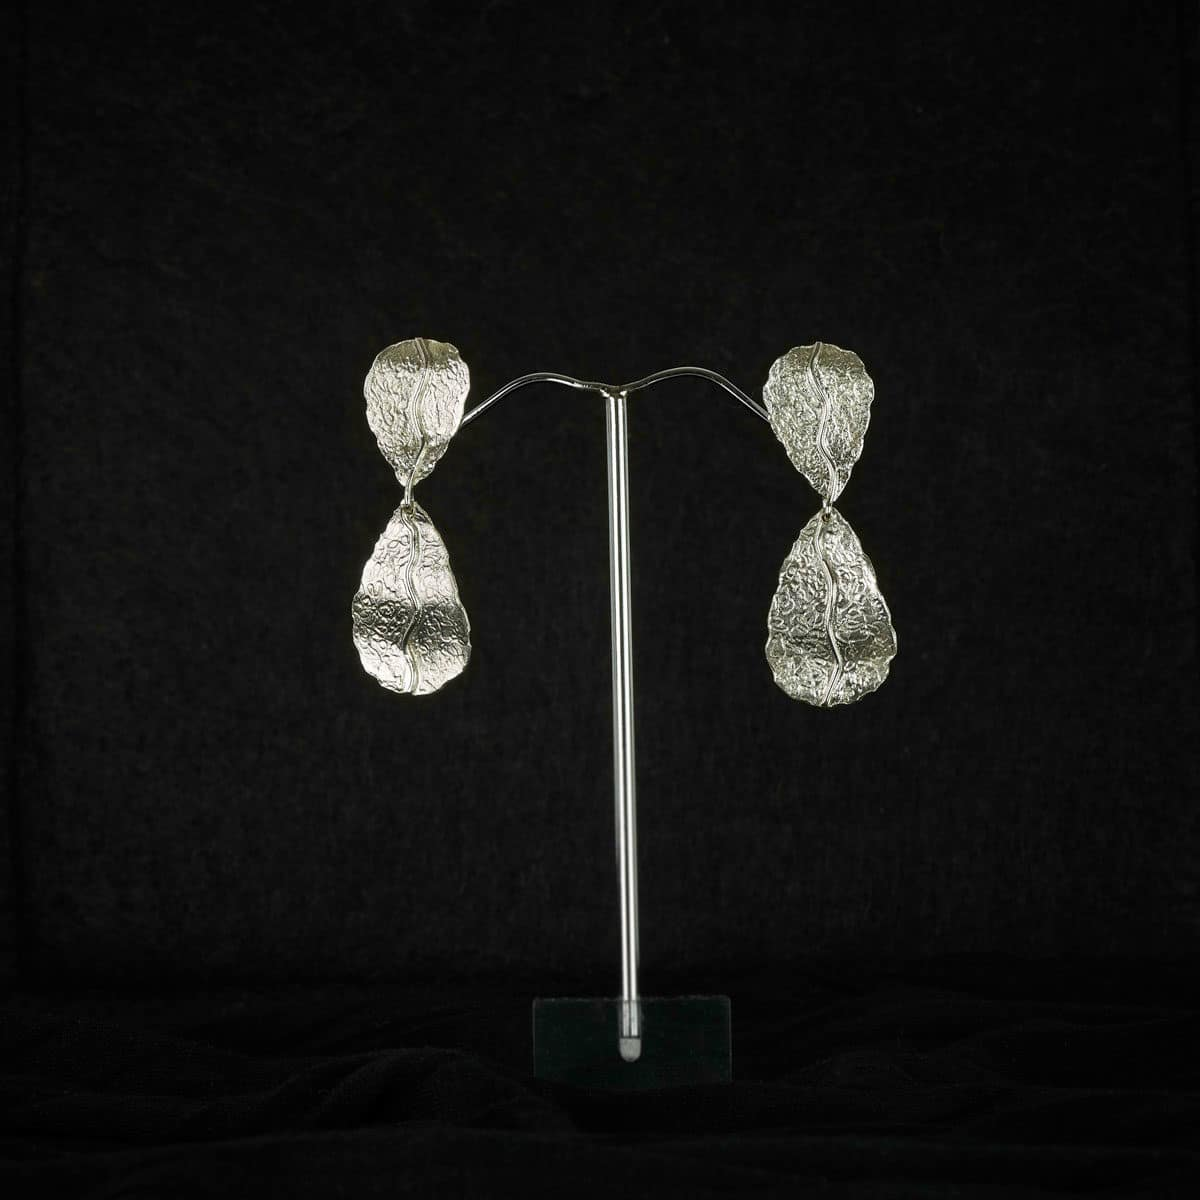 Pendientes de plata modelo Natura doble. Joyería artesanal en plata. Joyas Siliva.